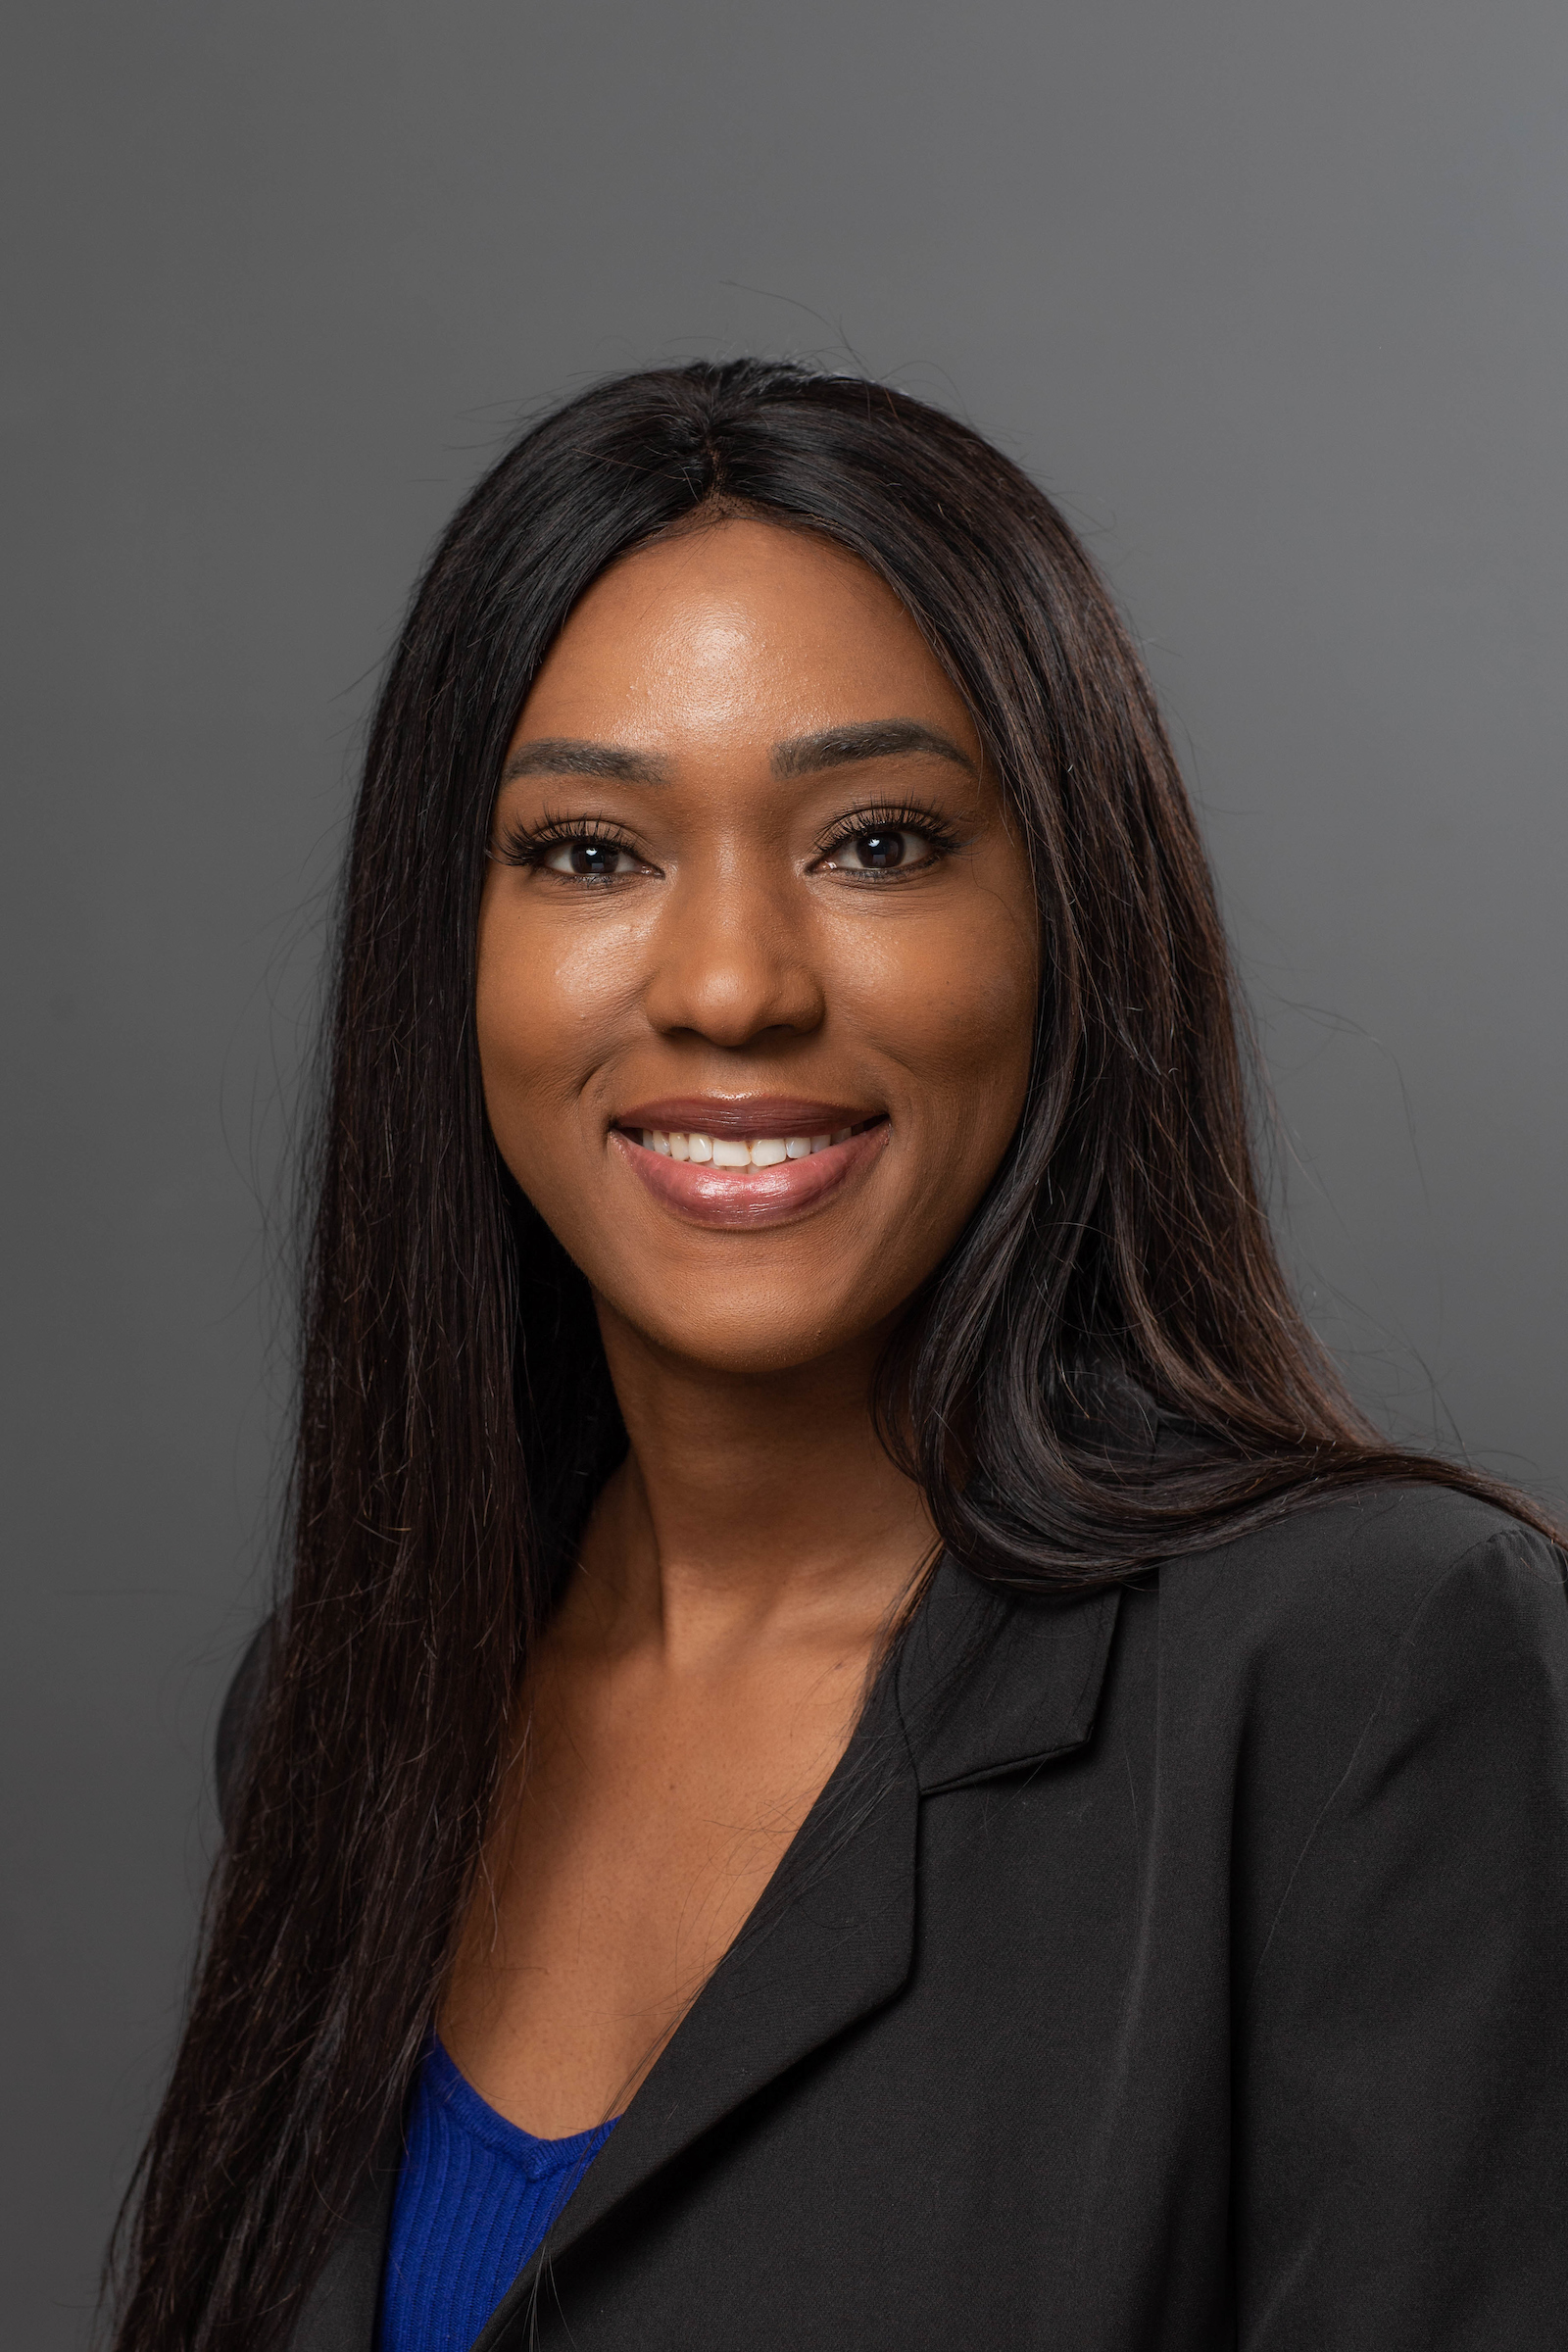 Photo of Victoria Nwosisi